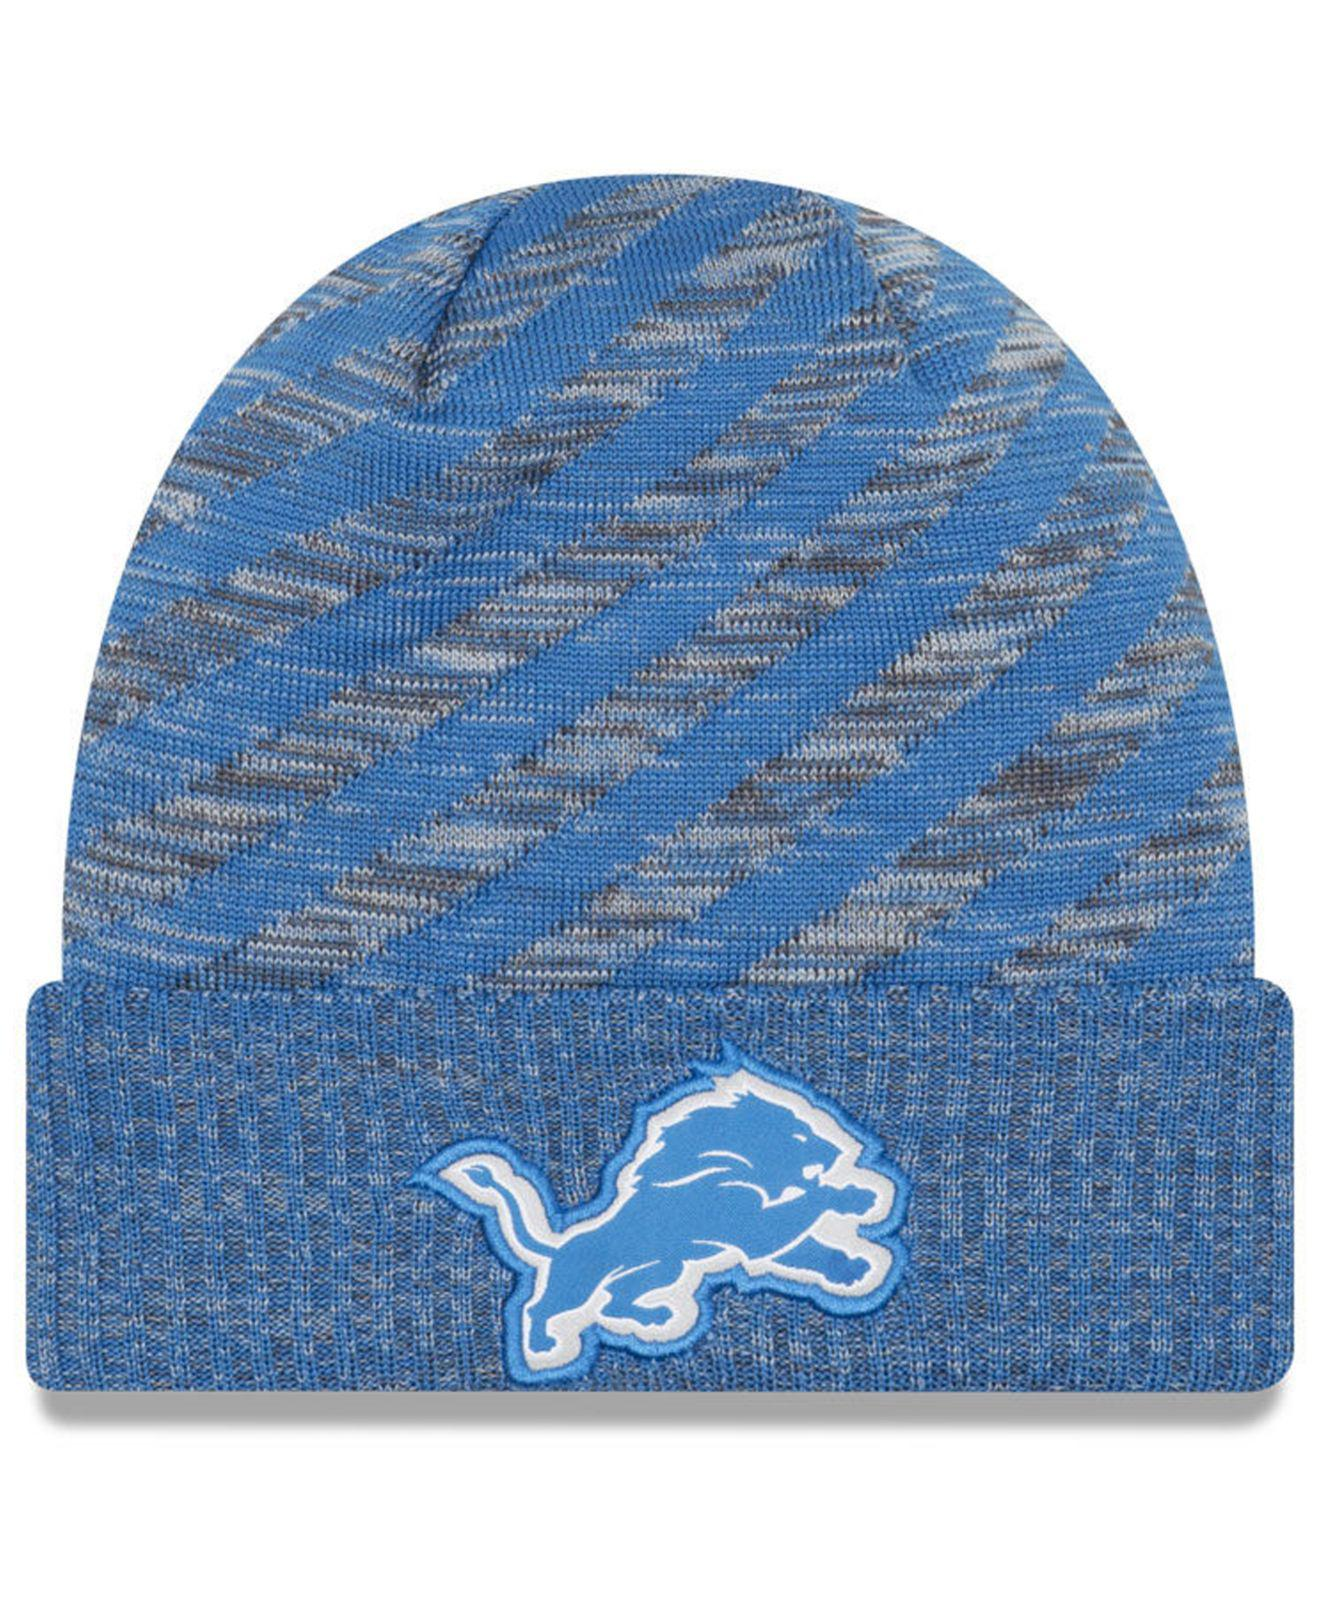 Lyst - Ktz Detroit Lions Touch Down Knit Hat in Blue for Men 99943f890